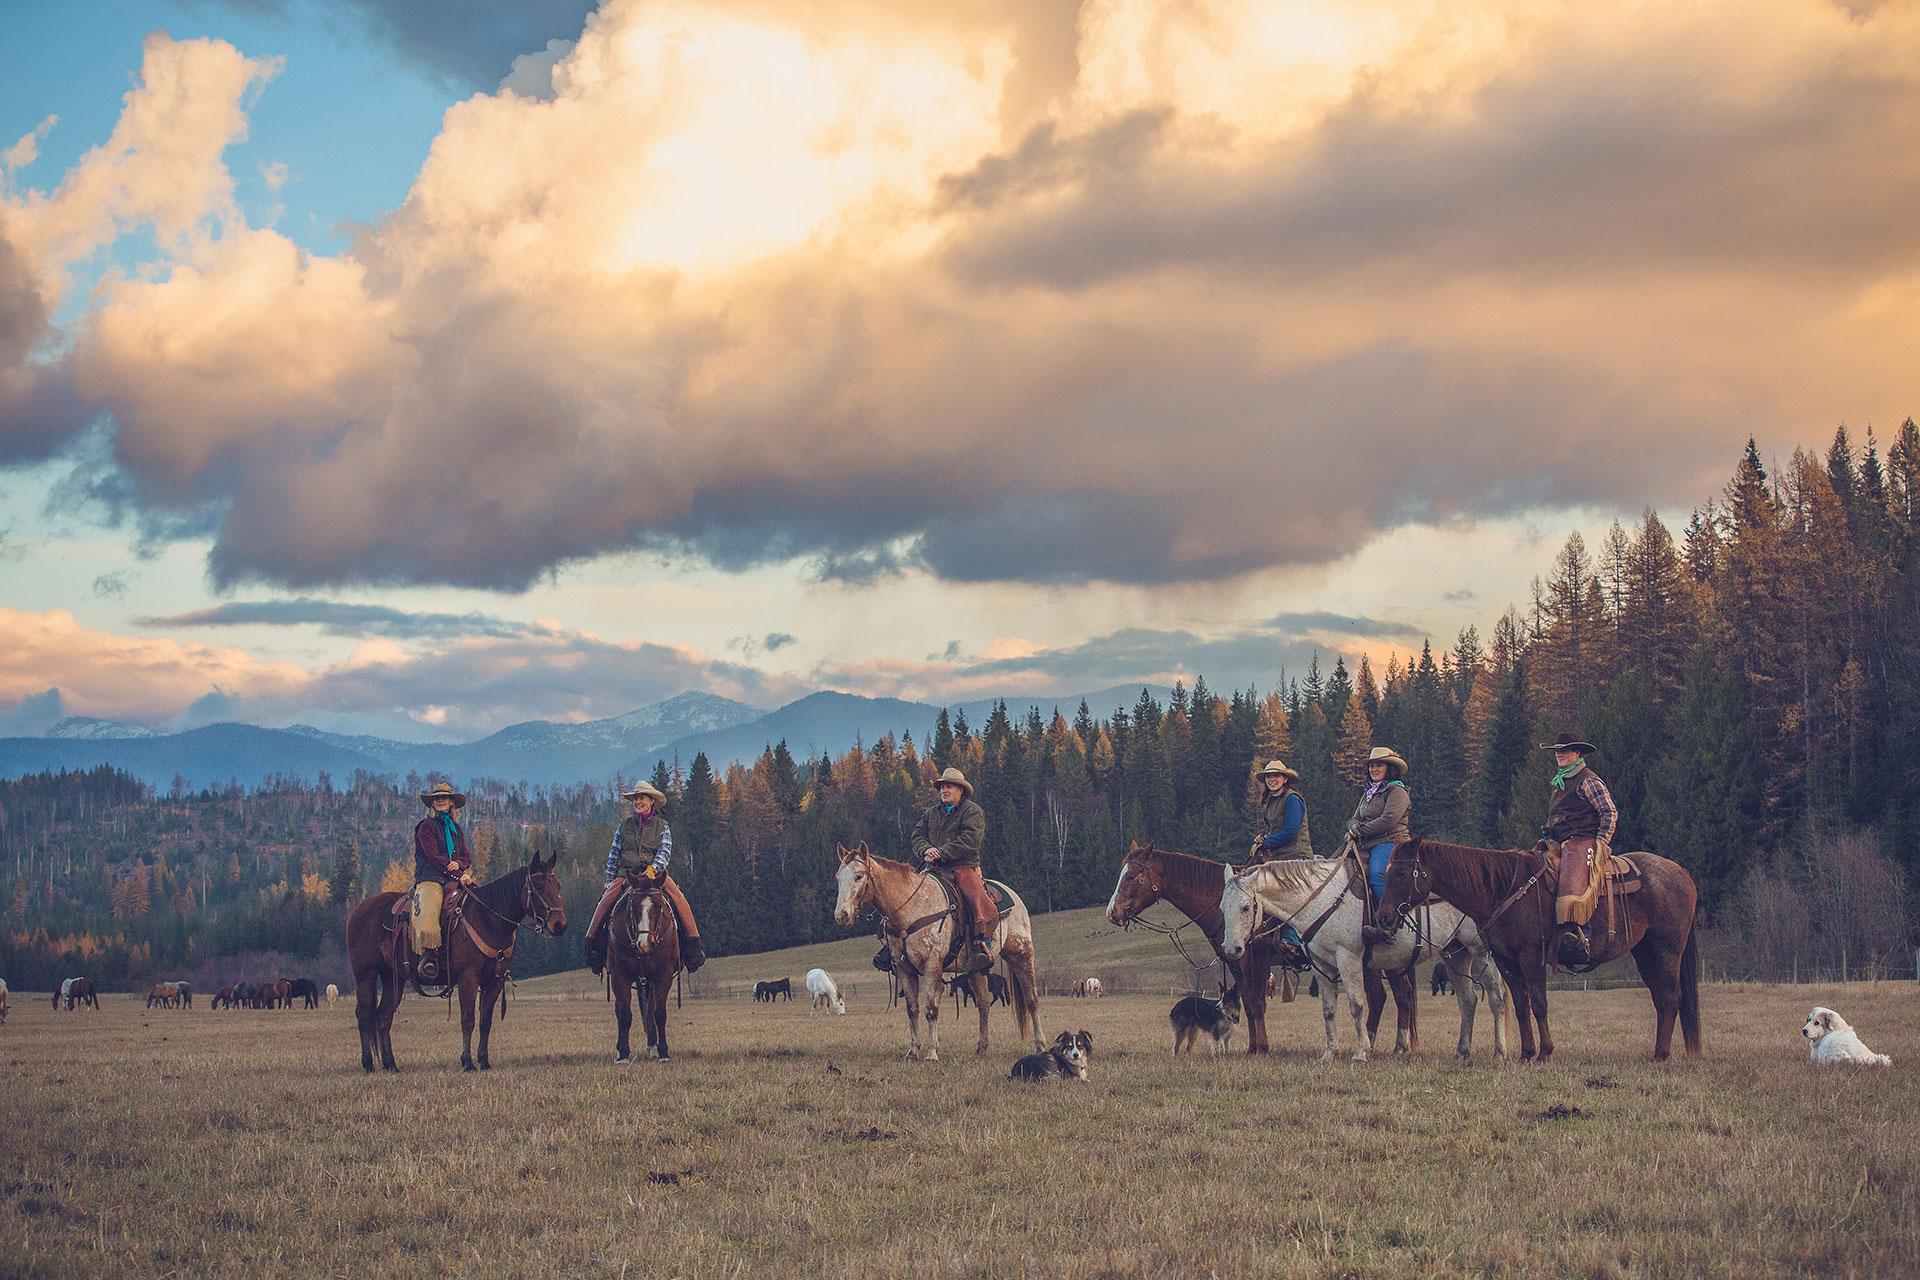 Western Pleasure Guest Ranch; Courtesy of Western Pleasure Guest Ranch